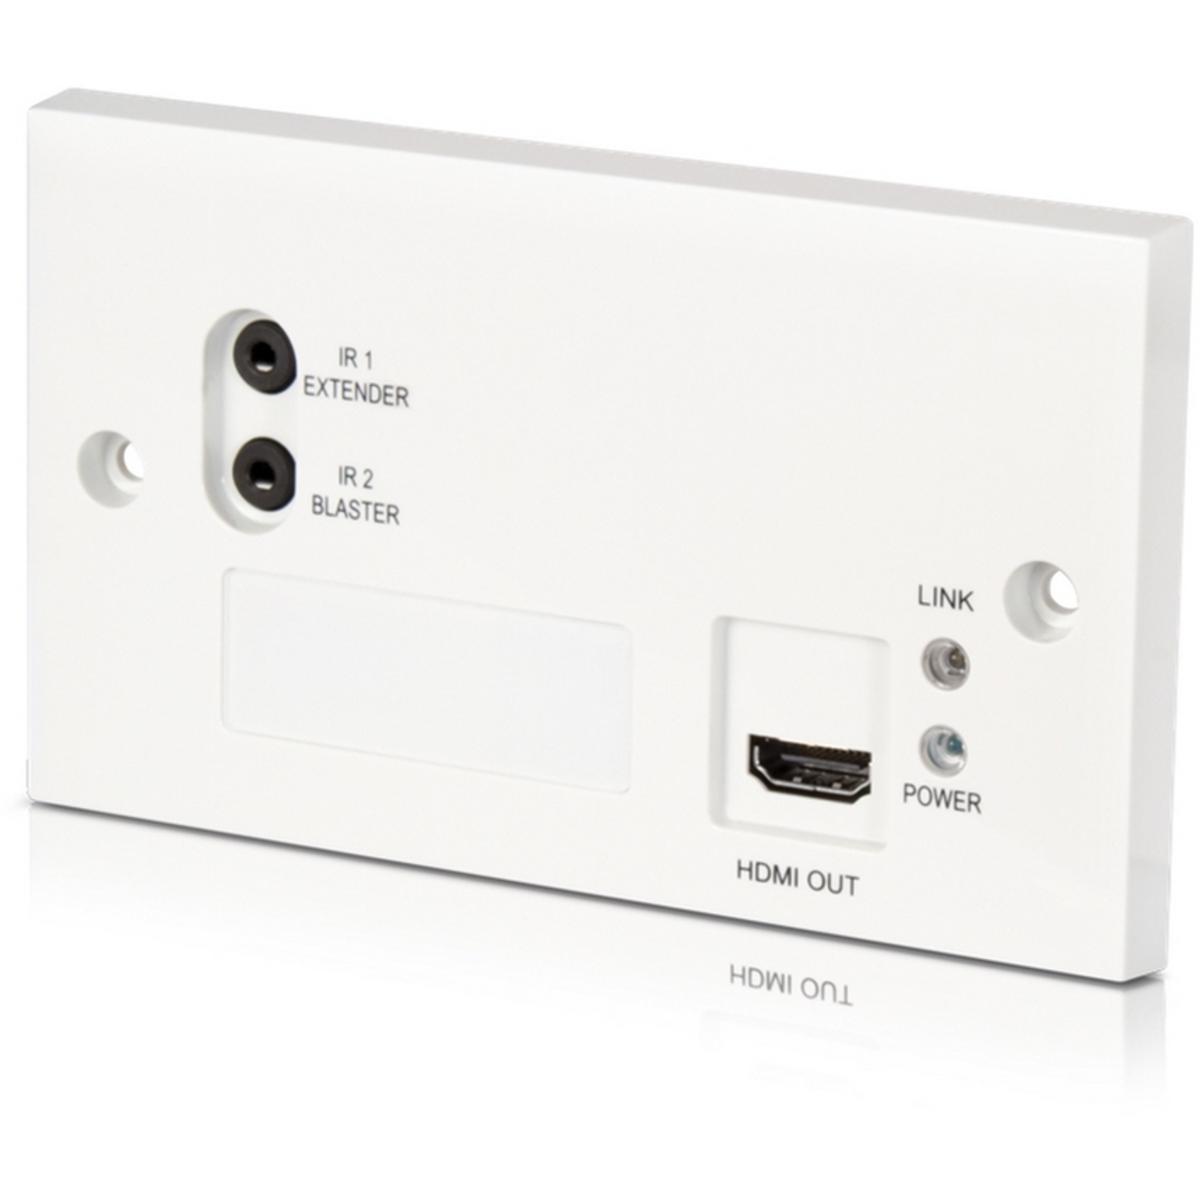 Buy Cyp Pu 515pl Wprx 4k Hdmi Hdbaset Lite Wall Plate Receiver Up Litetm Transmitter To 60m